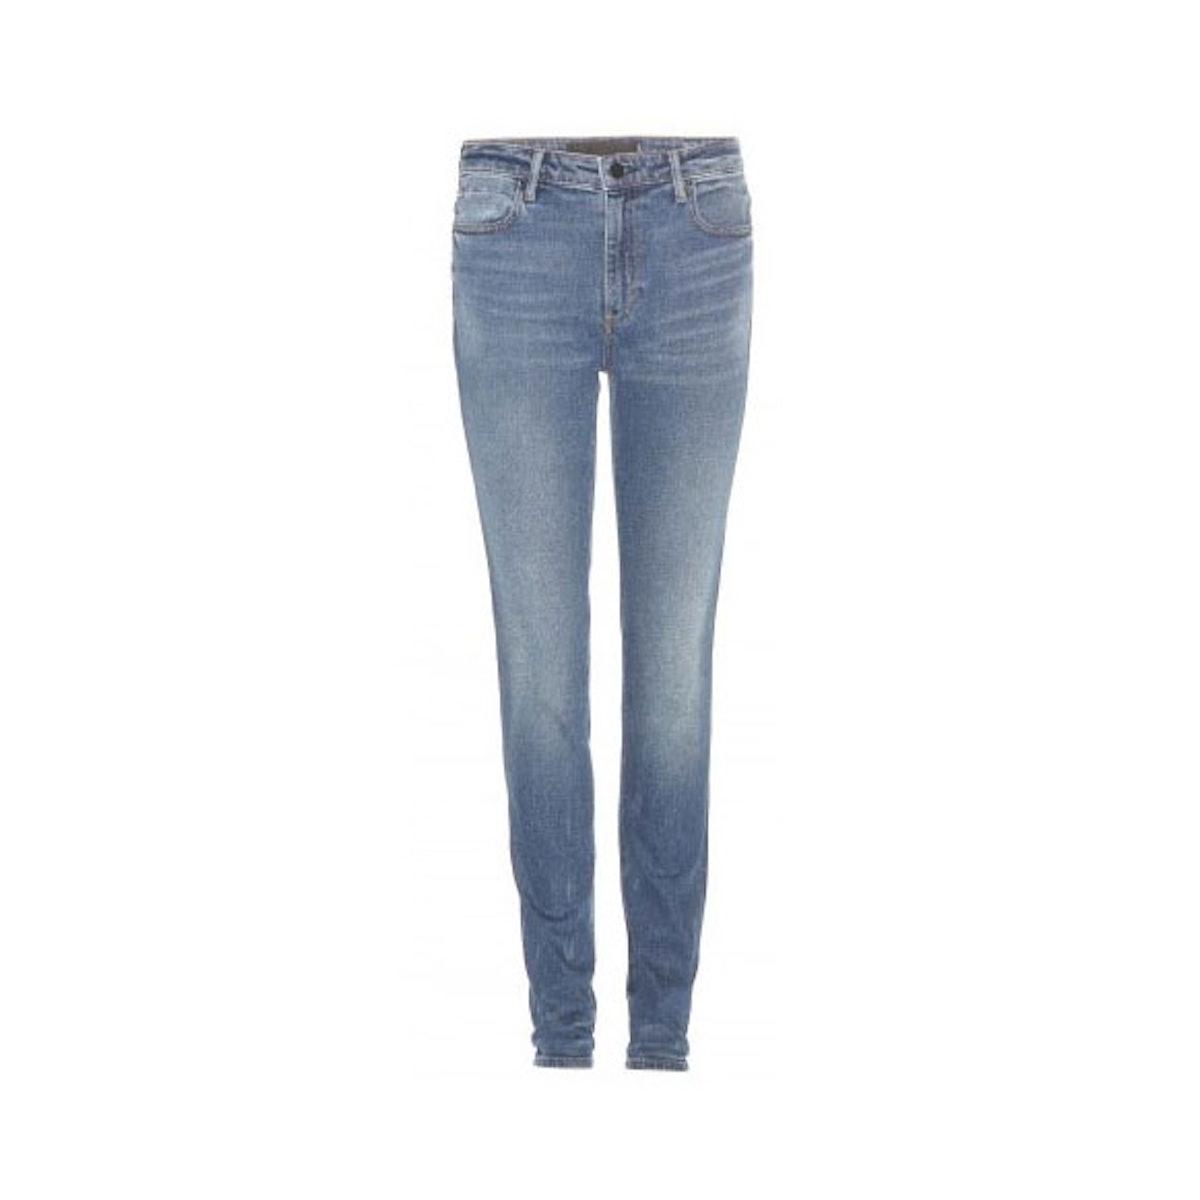 Alexander Wang 001 highrise skinny jeans